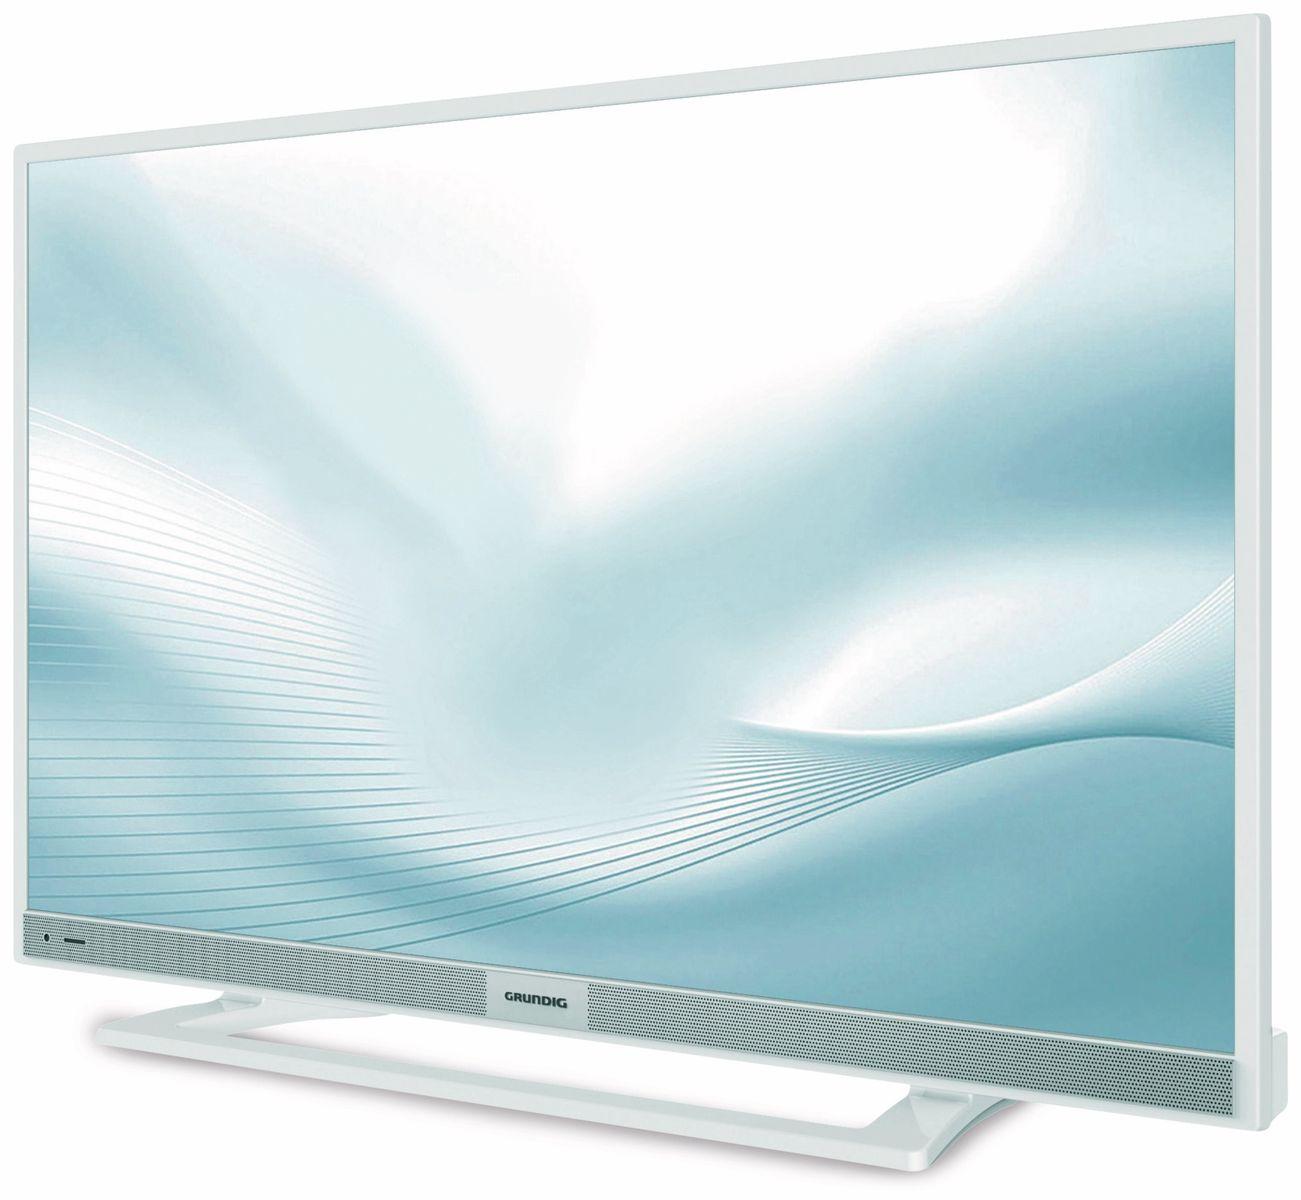 led tv grundig 22 gfw 5730 wei eek a 22 online kaufen. Black Bedroom Furniture Sets. Home Design Ideas